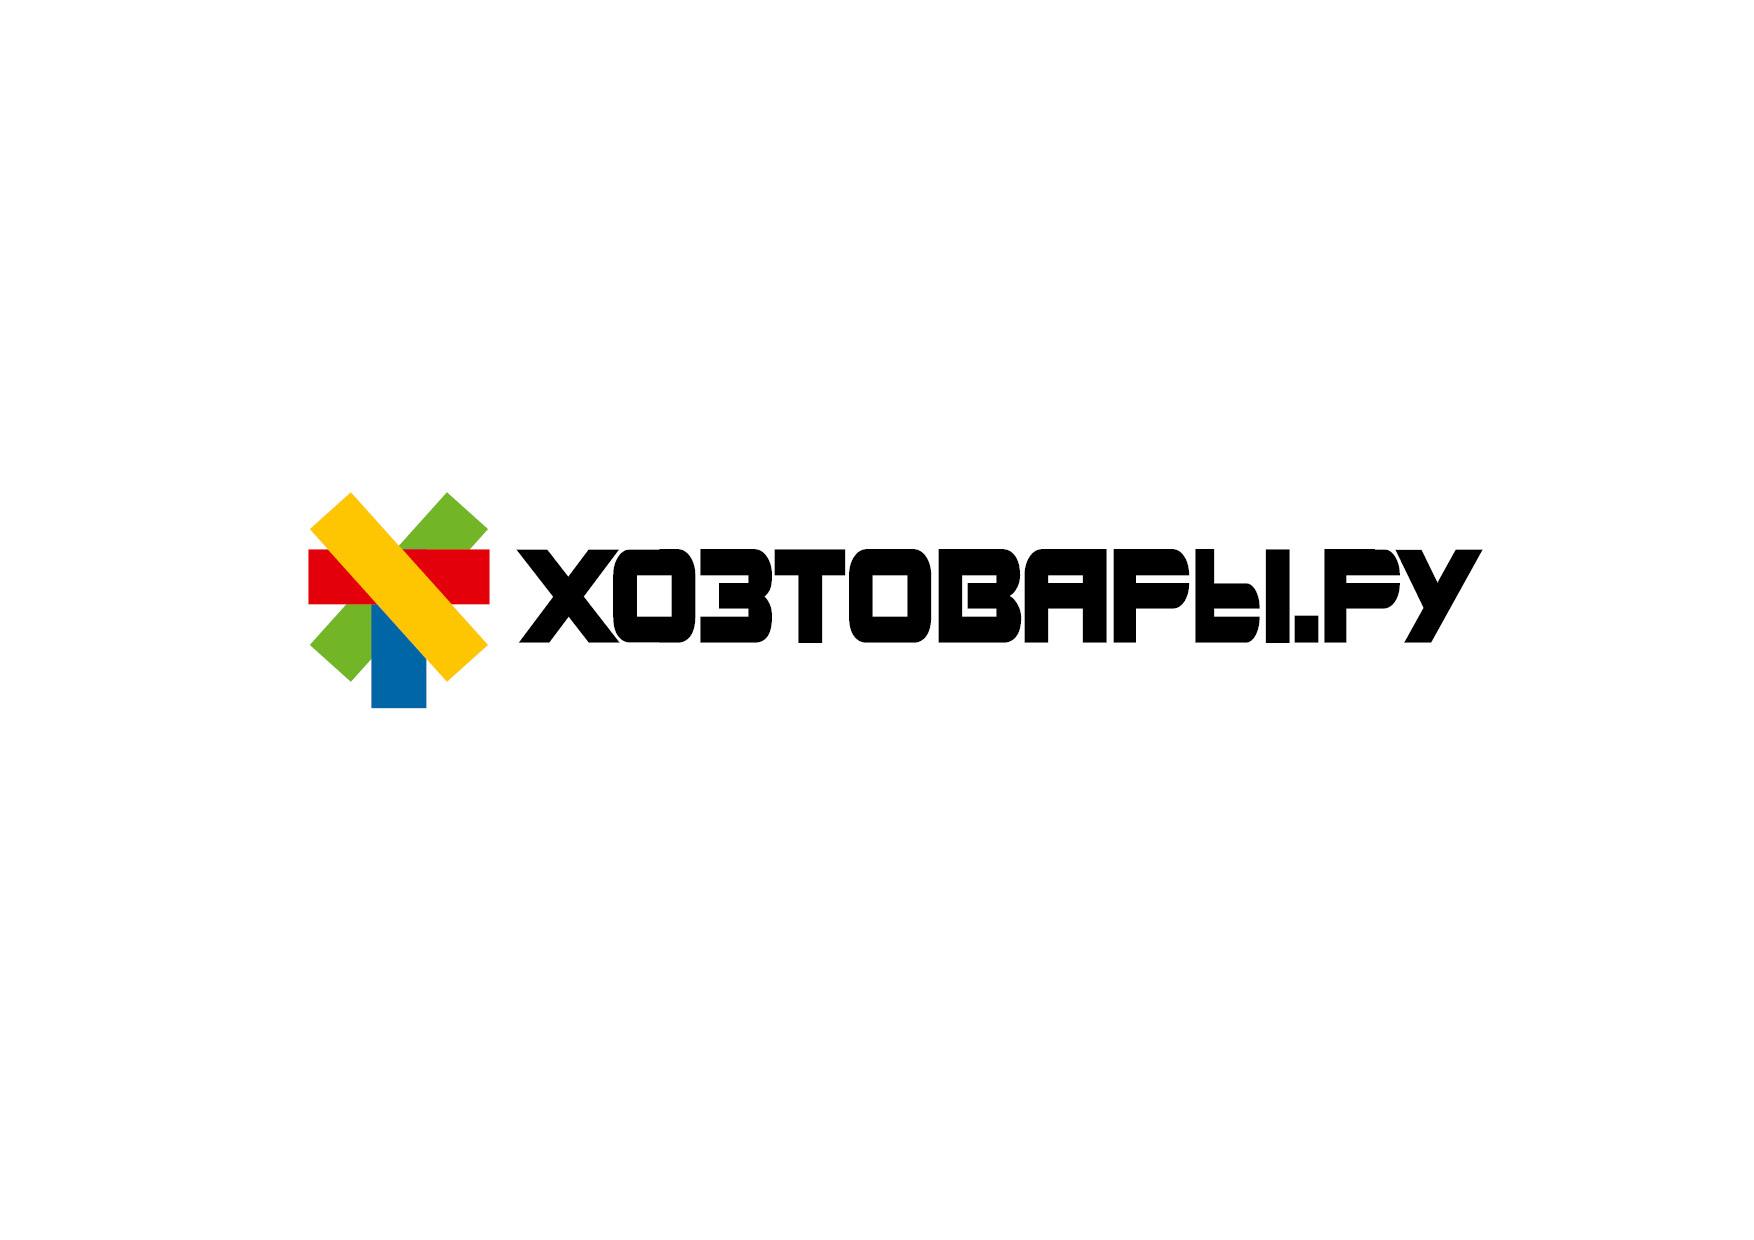 Разработка логотипа для оптового интернет-магазина «Хозтовары.ру» фото f_764606f5bbaac830.jpg